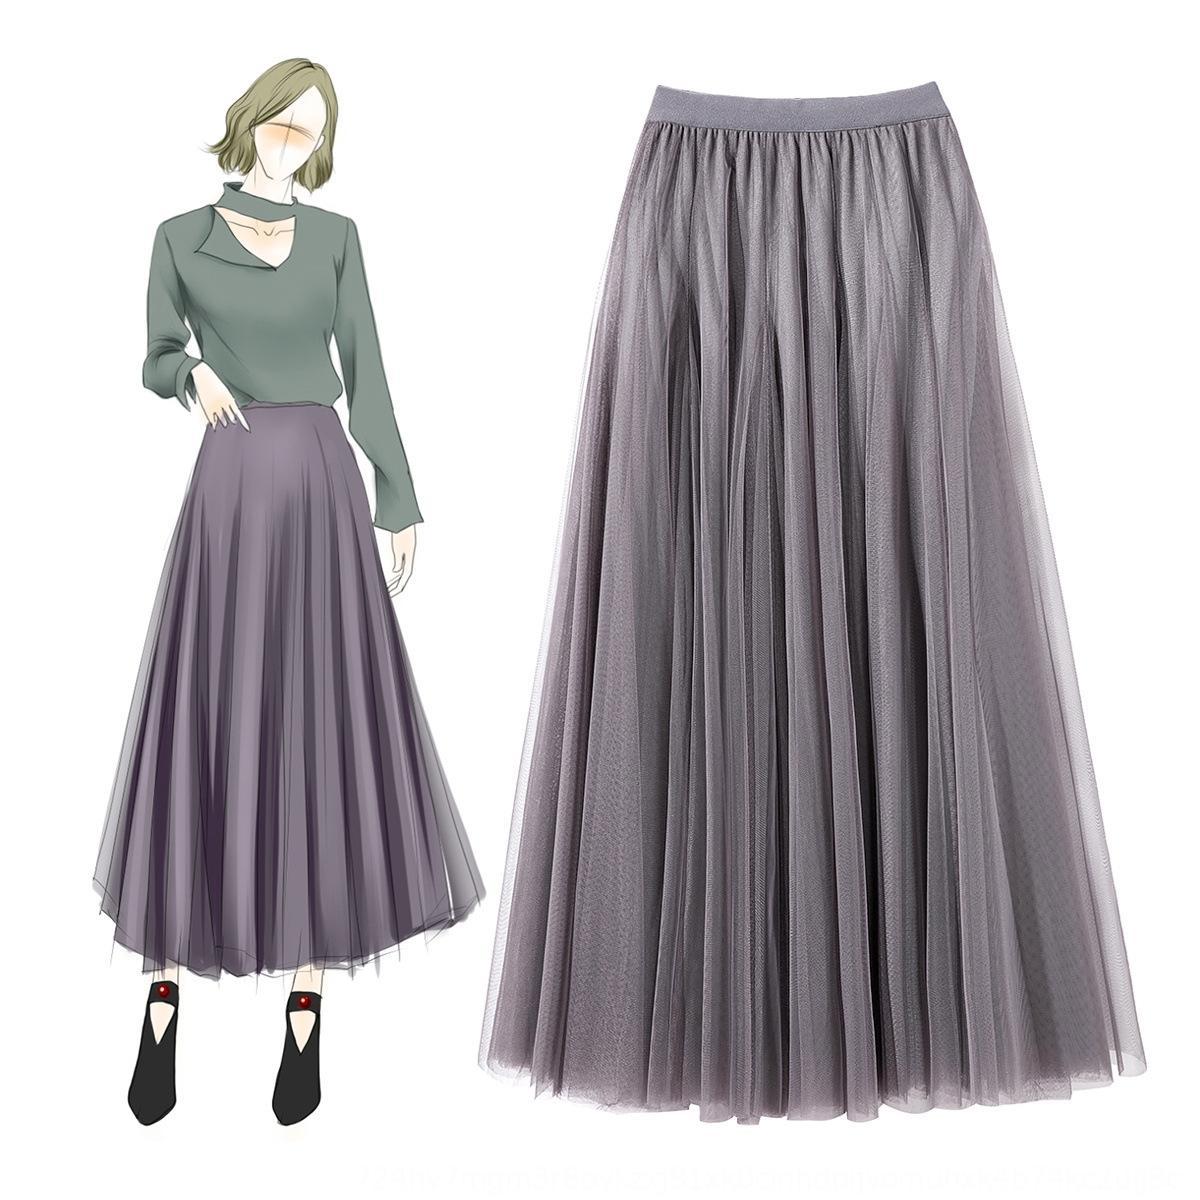 1qG8v Fashion boutique women's Fashion boutique 811305 early spring new elastic waist mesh large skirt internet celebrity slim lady skirt 81